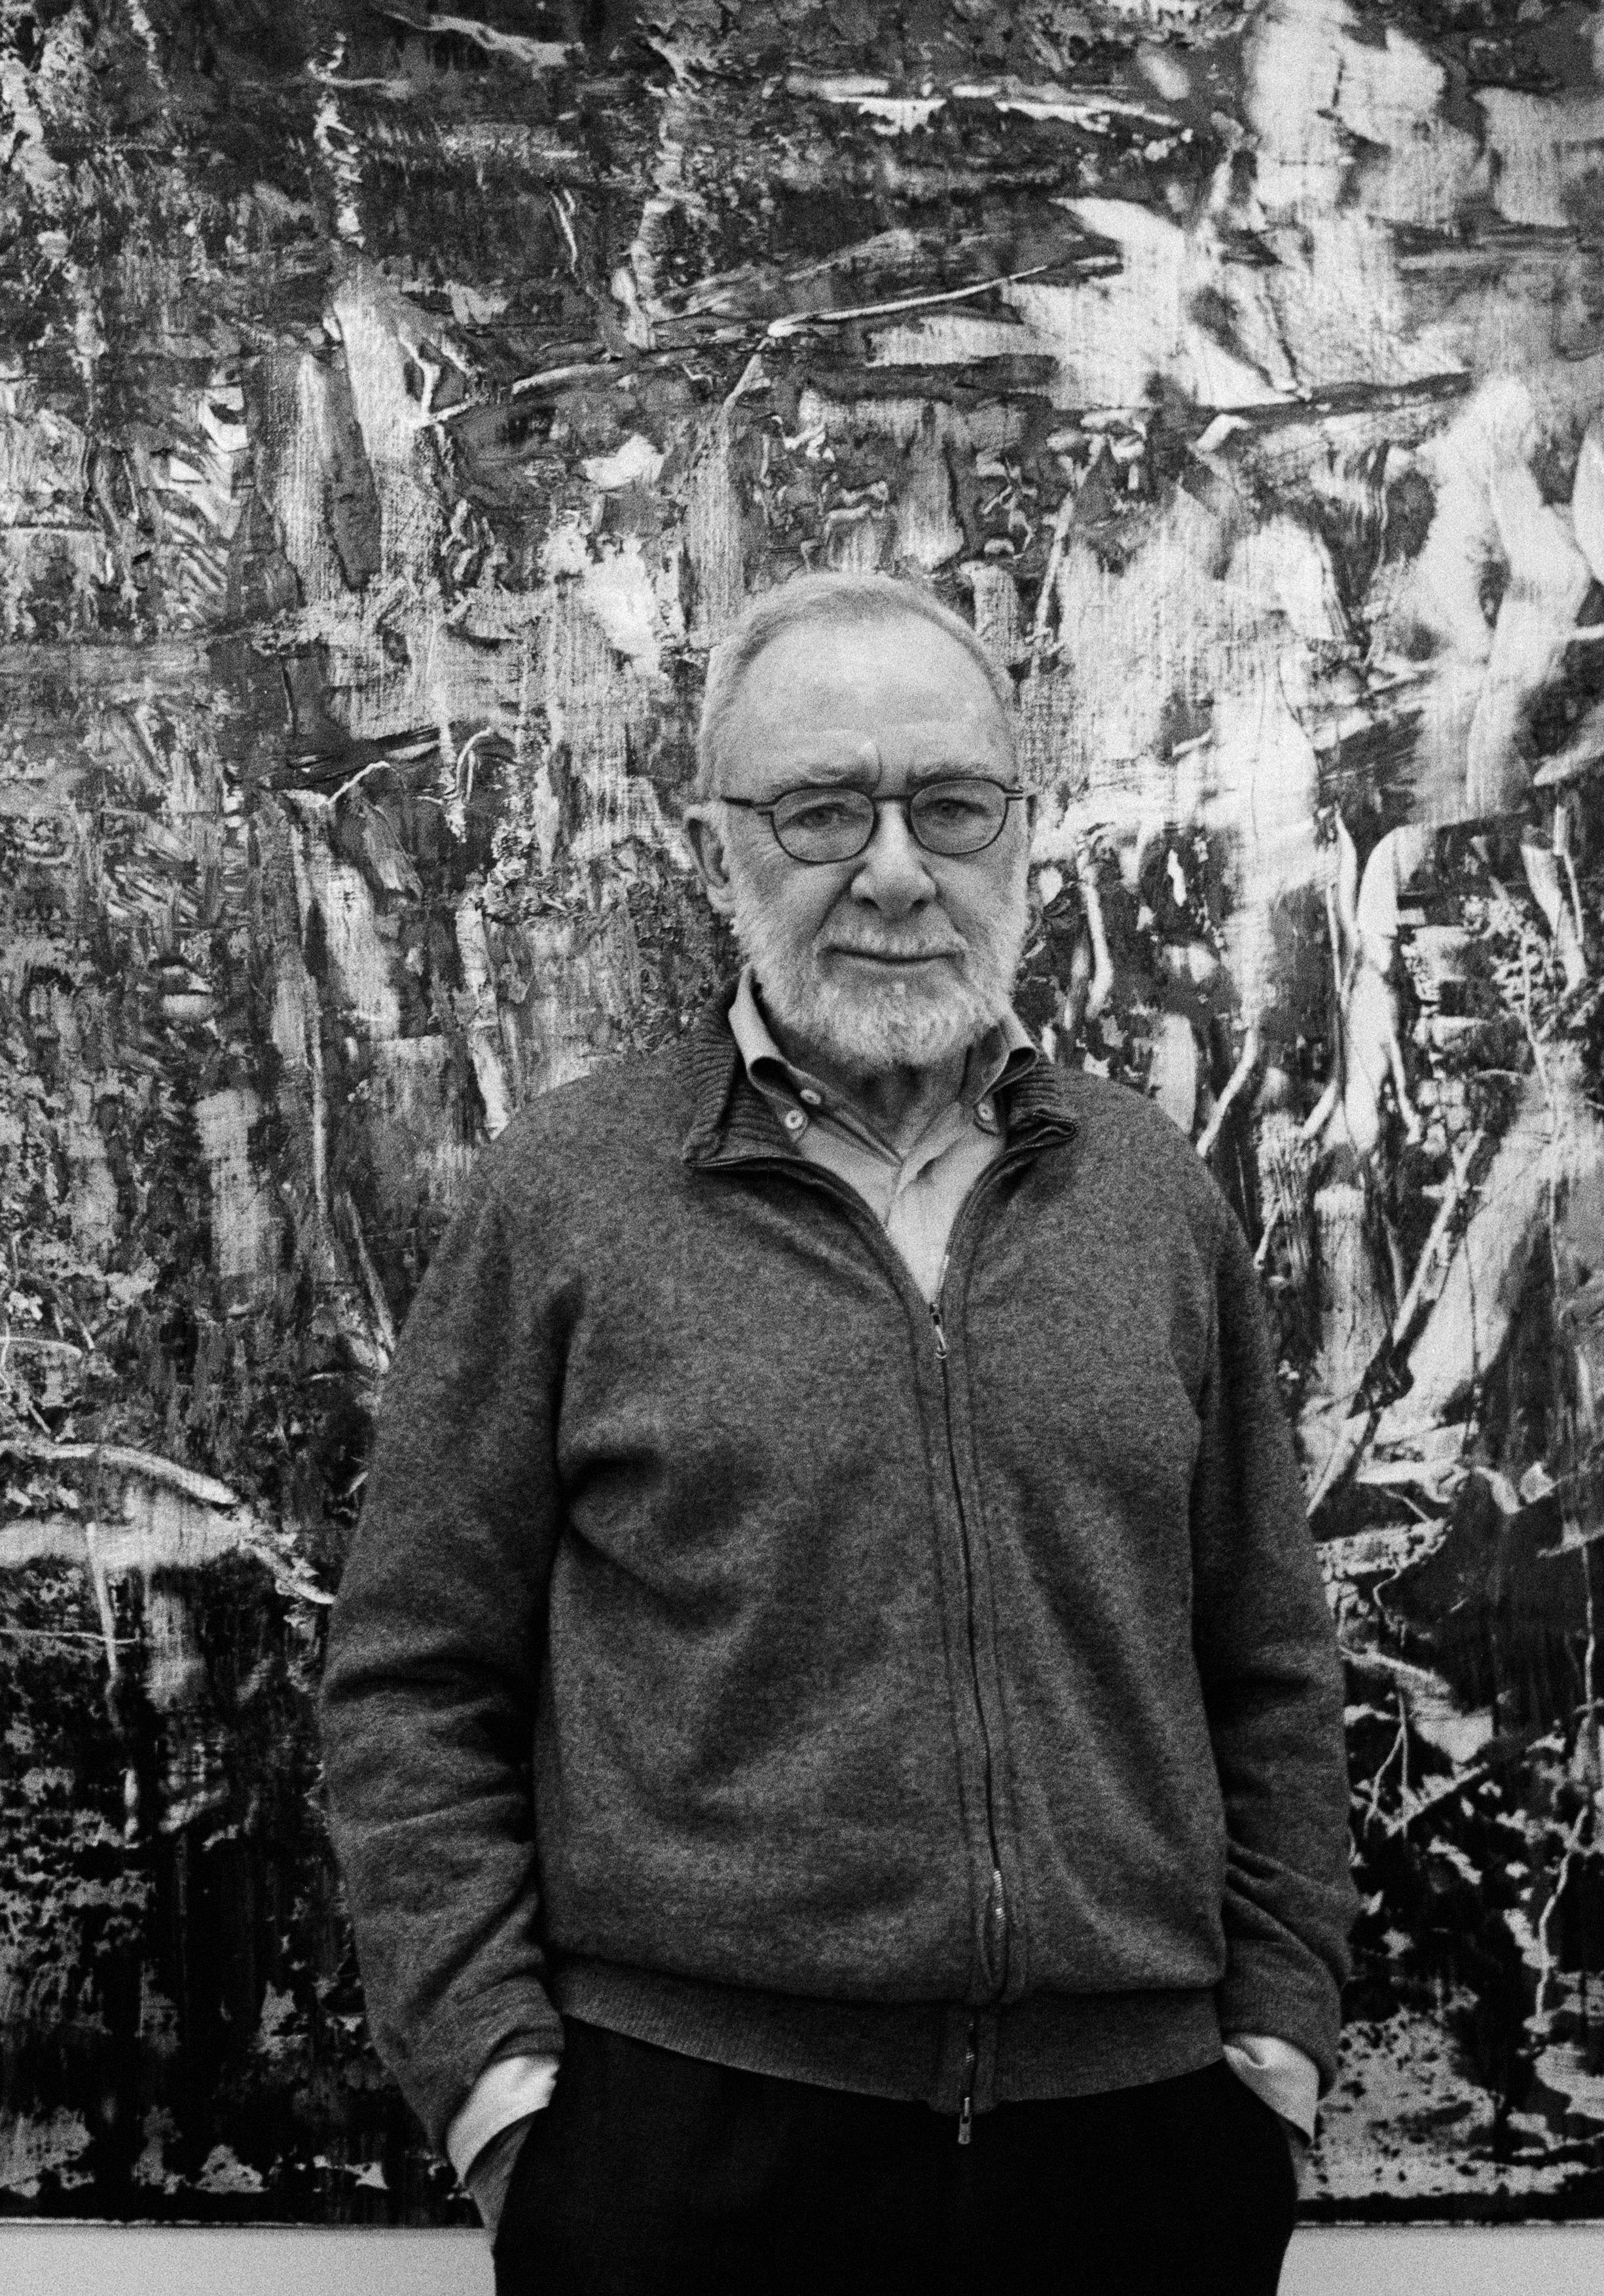 Portrait de Gerhard Richter © Gerhard Richter